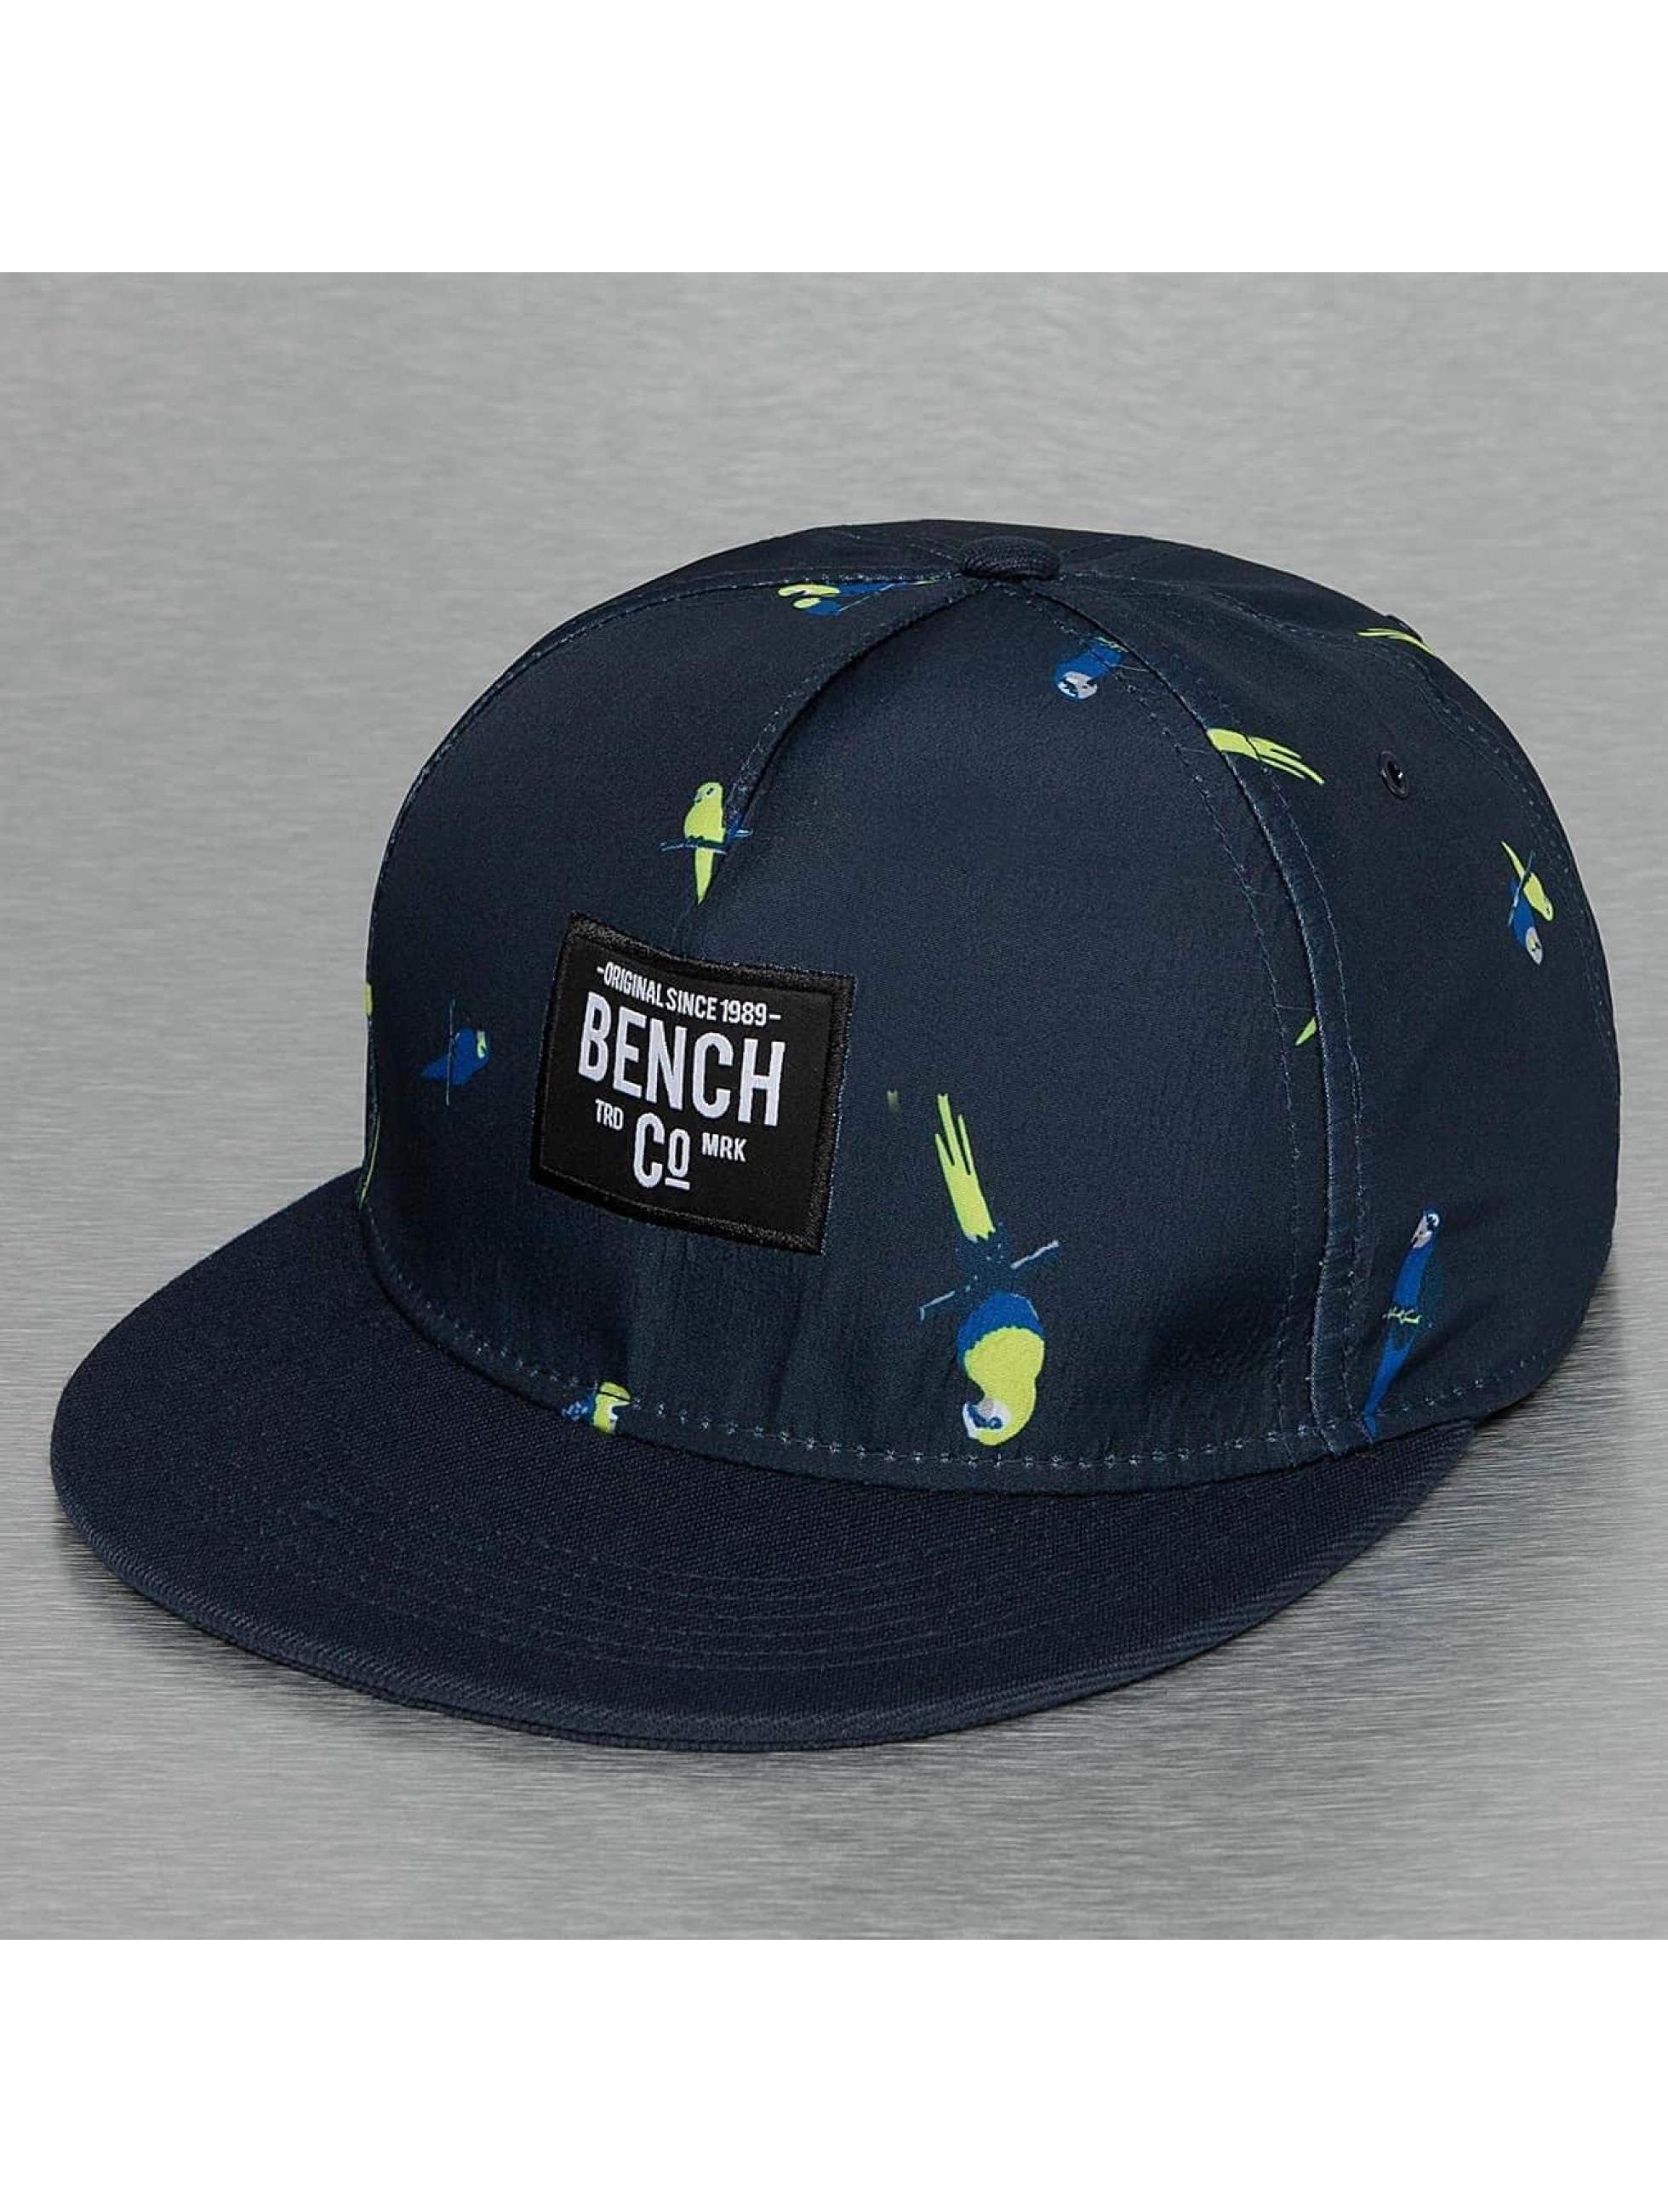 Bench Männer,Frauen Snapback Cap Parrot Print in blau